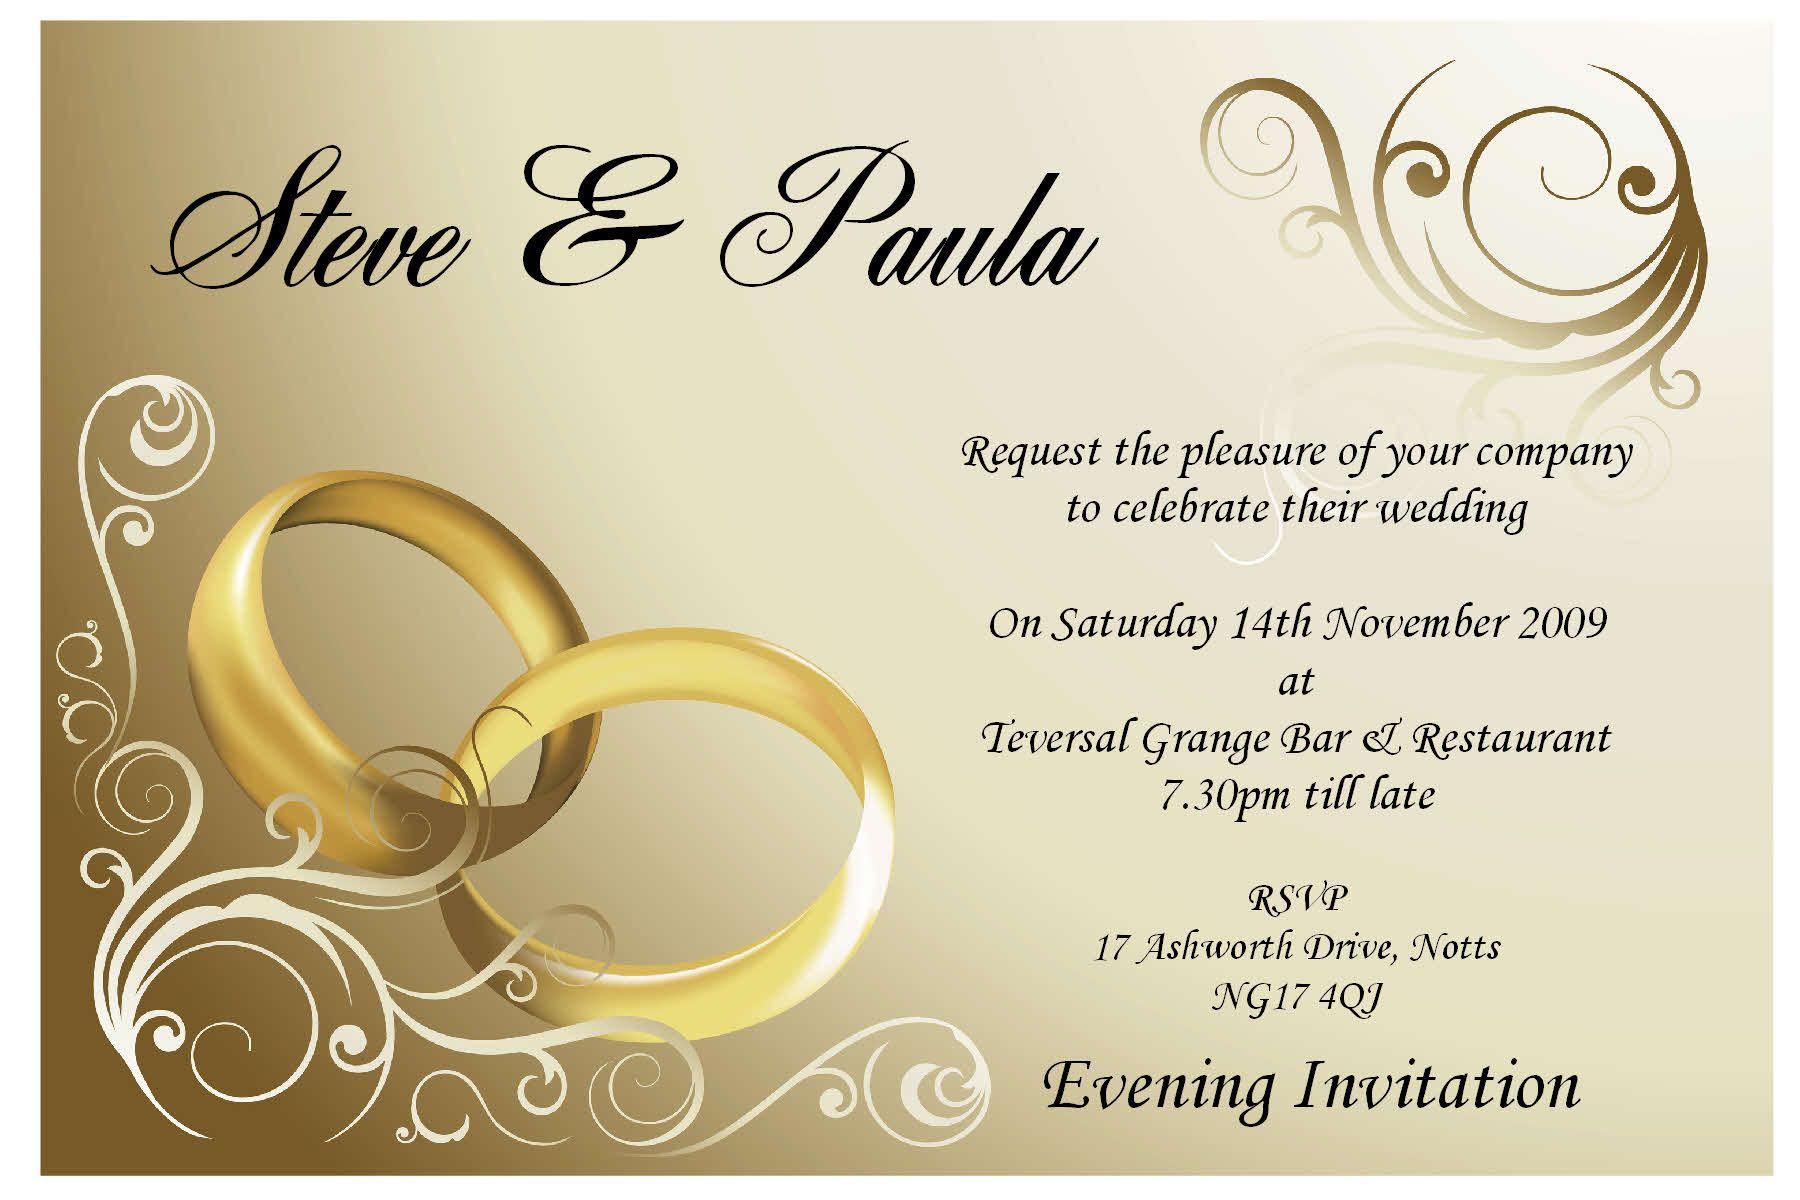 Sample Of Graduation Invitation Cards. Invitation Templates In Engagement Invitation Card Template